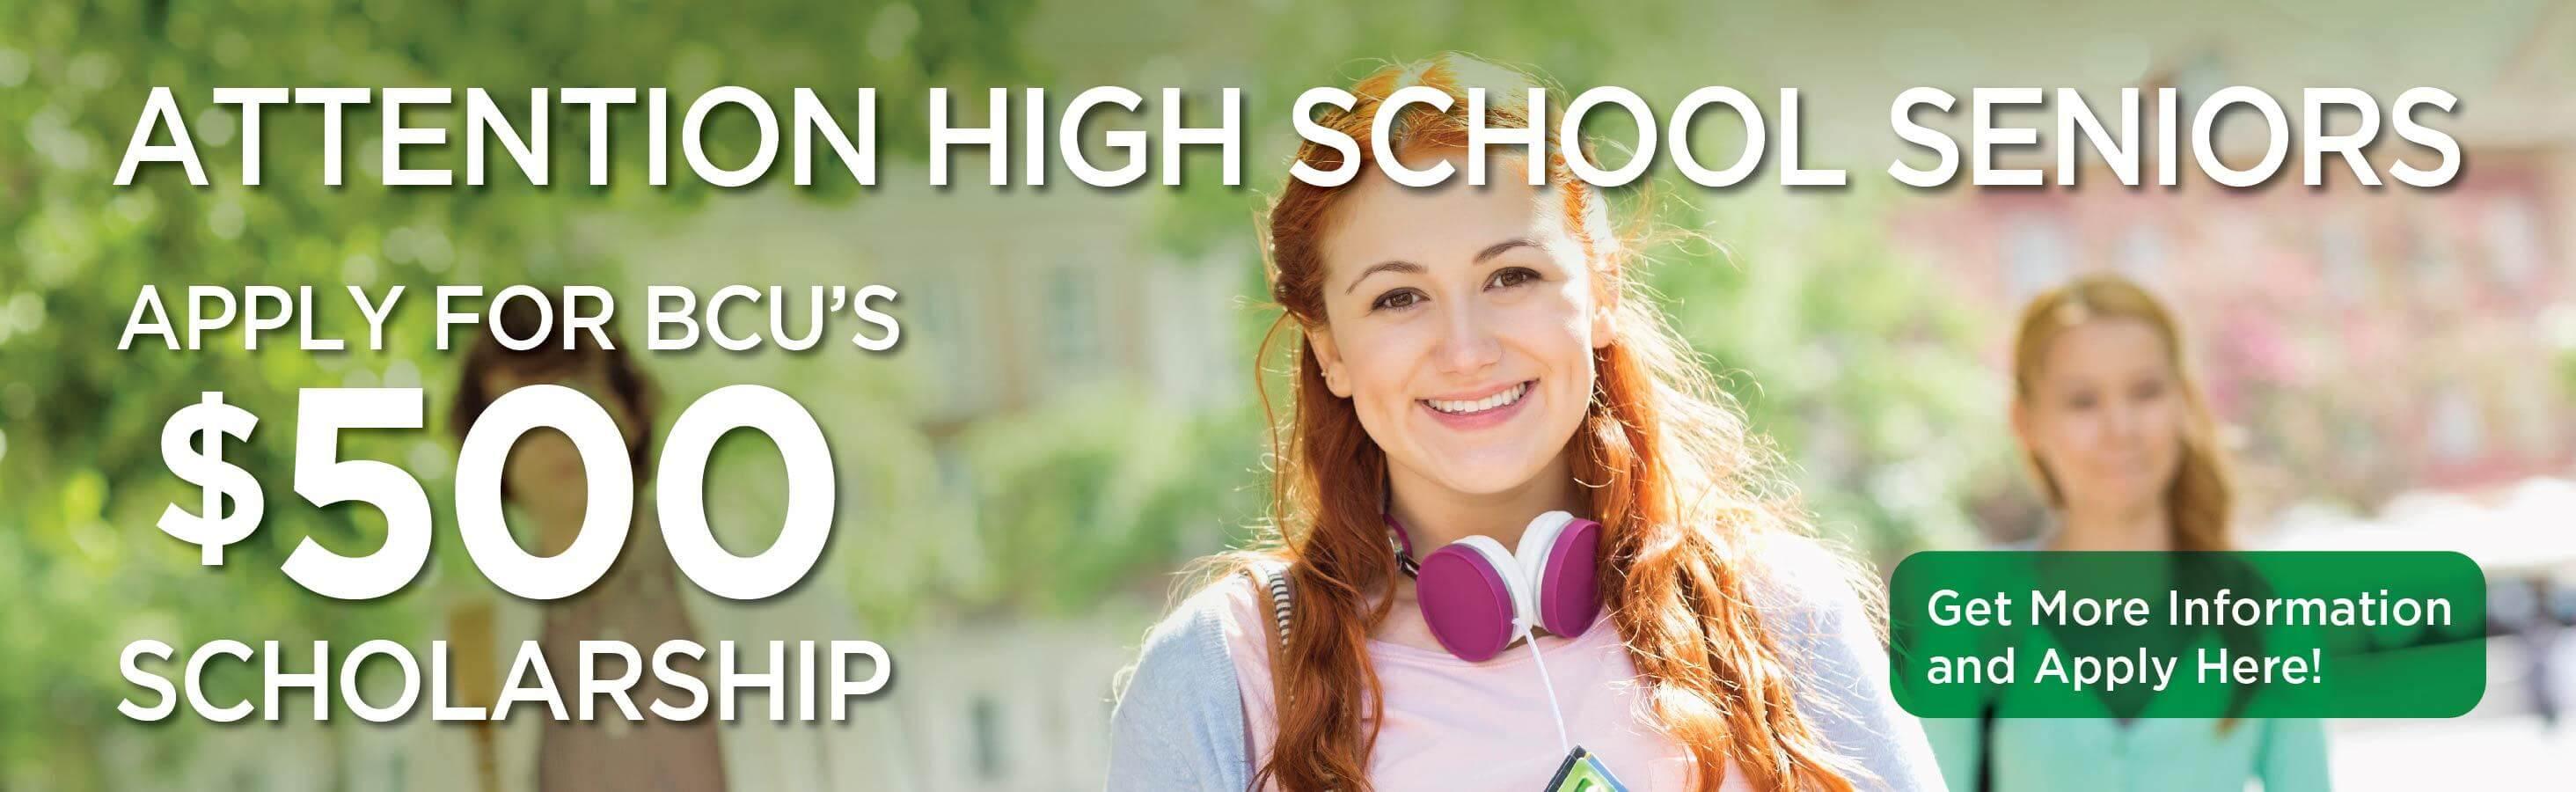 Apply for a BCU Scholarship!